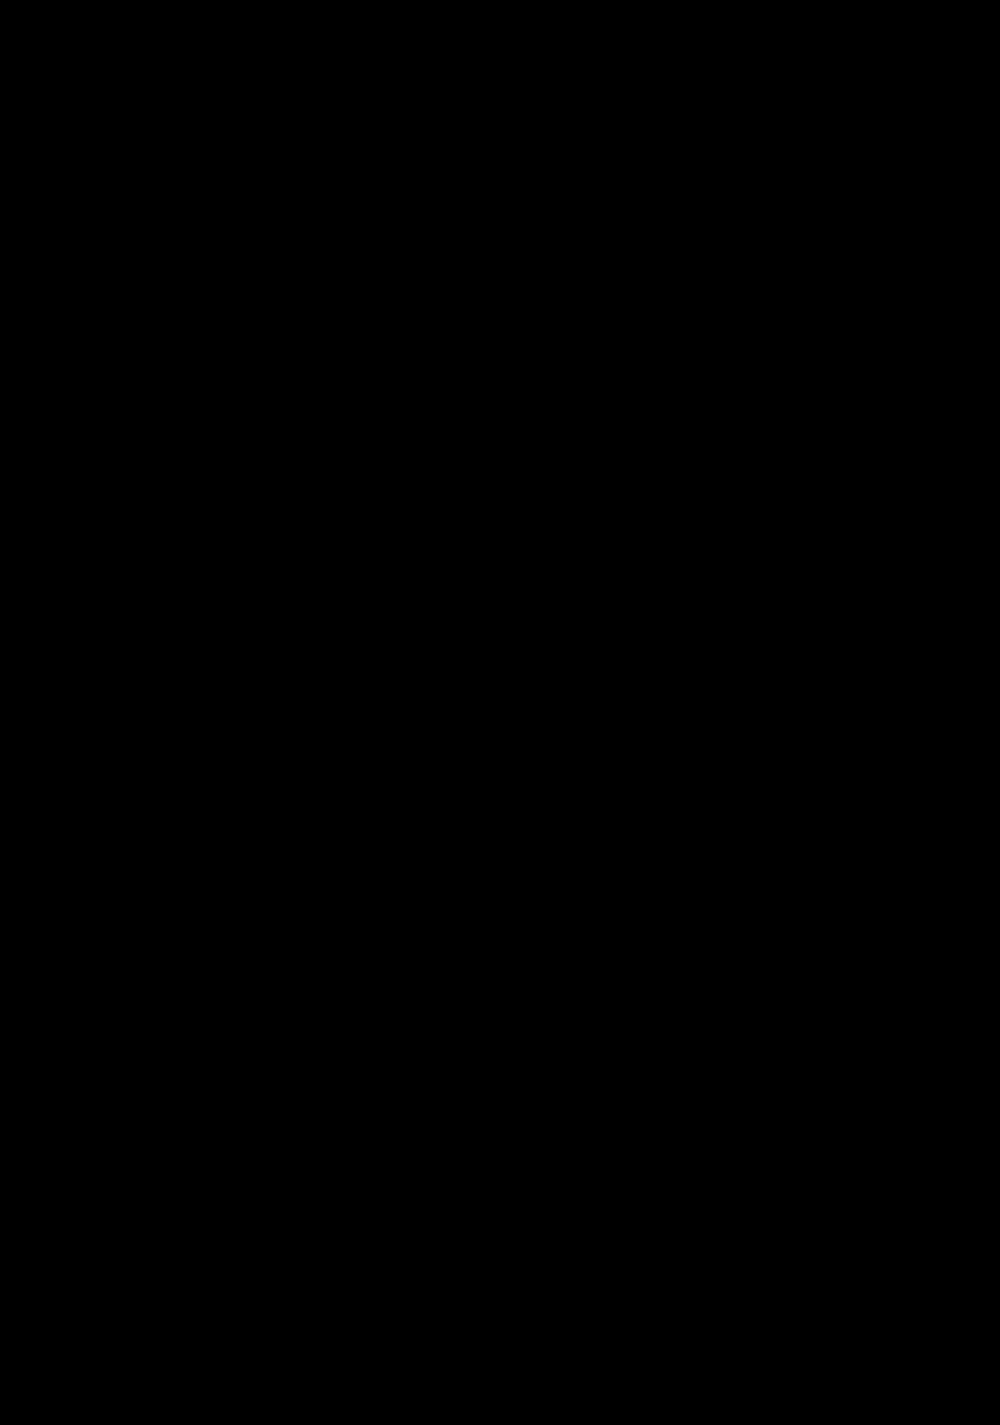 影片-logo-black.png